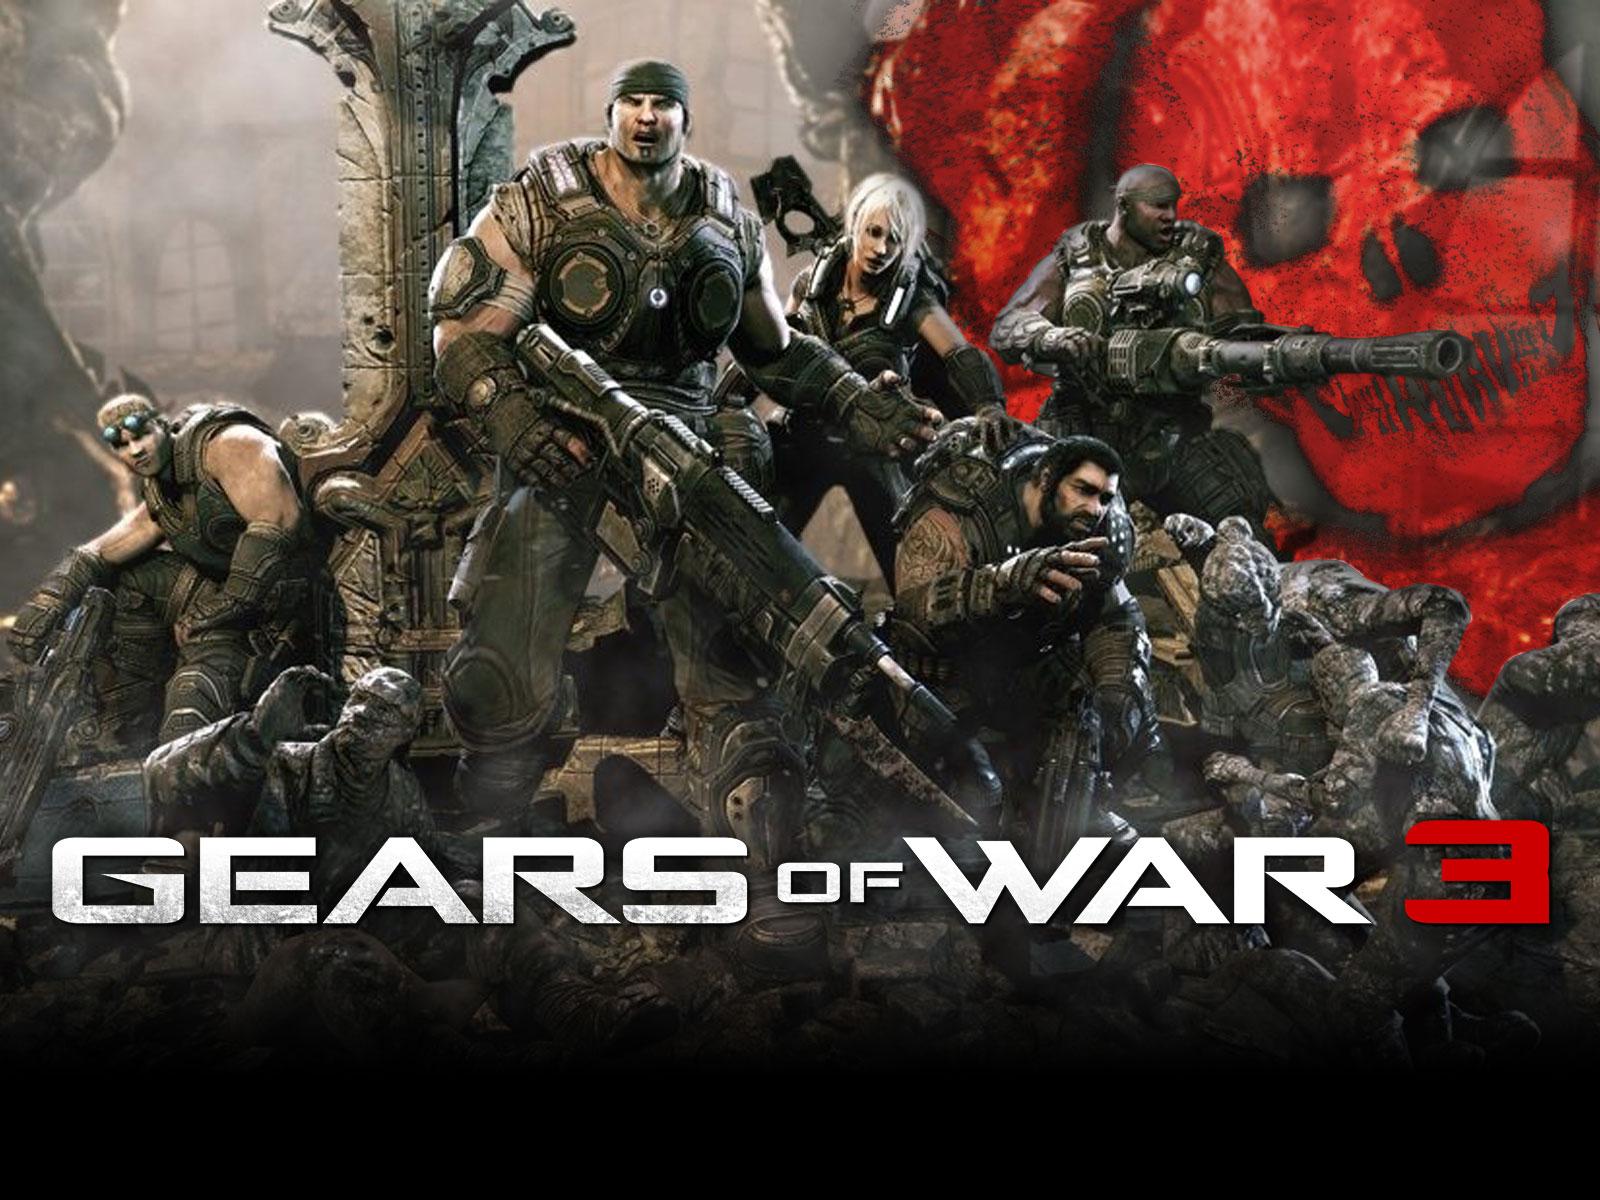 http://4.bp.blogspot.com/-ZLUw4PW4r3Q/TbVb54jpmtI/AAAAAAAAAHM/tmPIbXmrpCs/s1600/gears-of-war-3-wallpaper.jpg